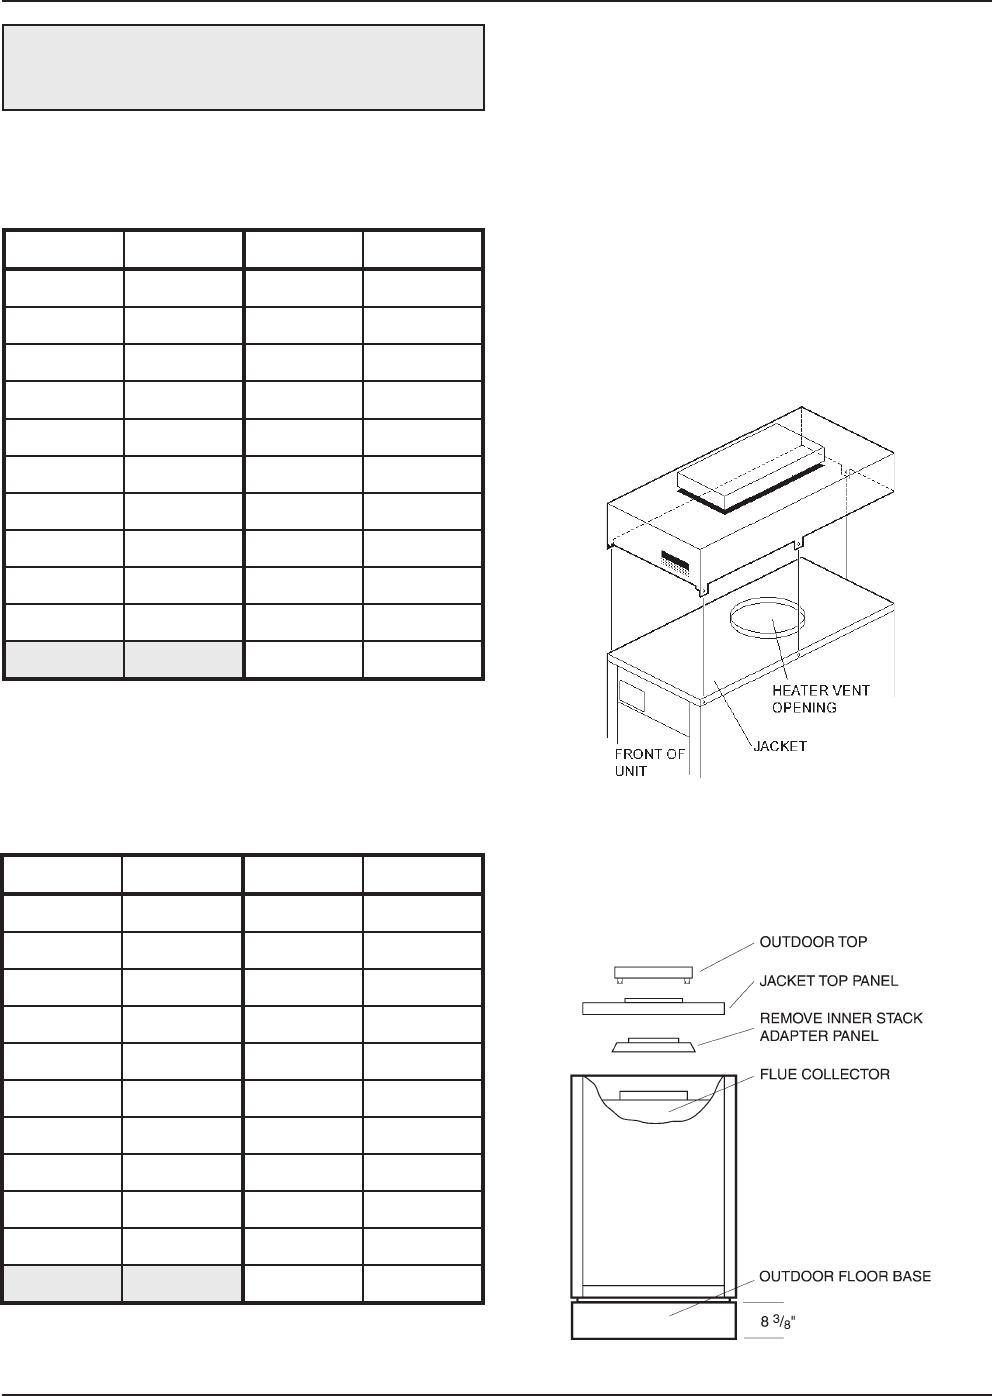 medium resolution of raypak h3 1336 wiring diagram